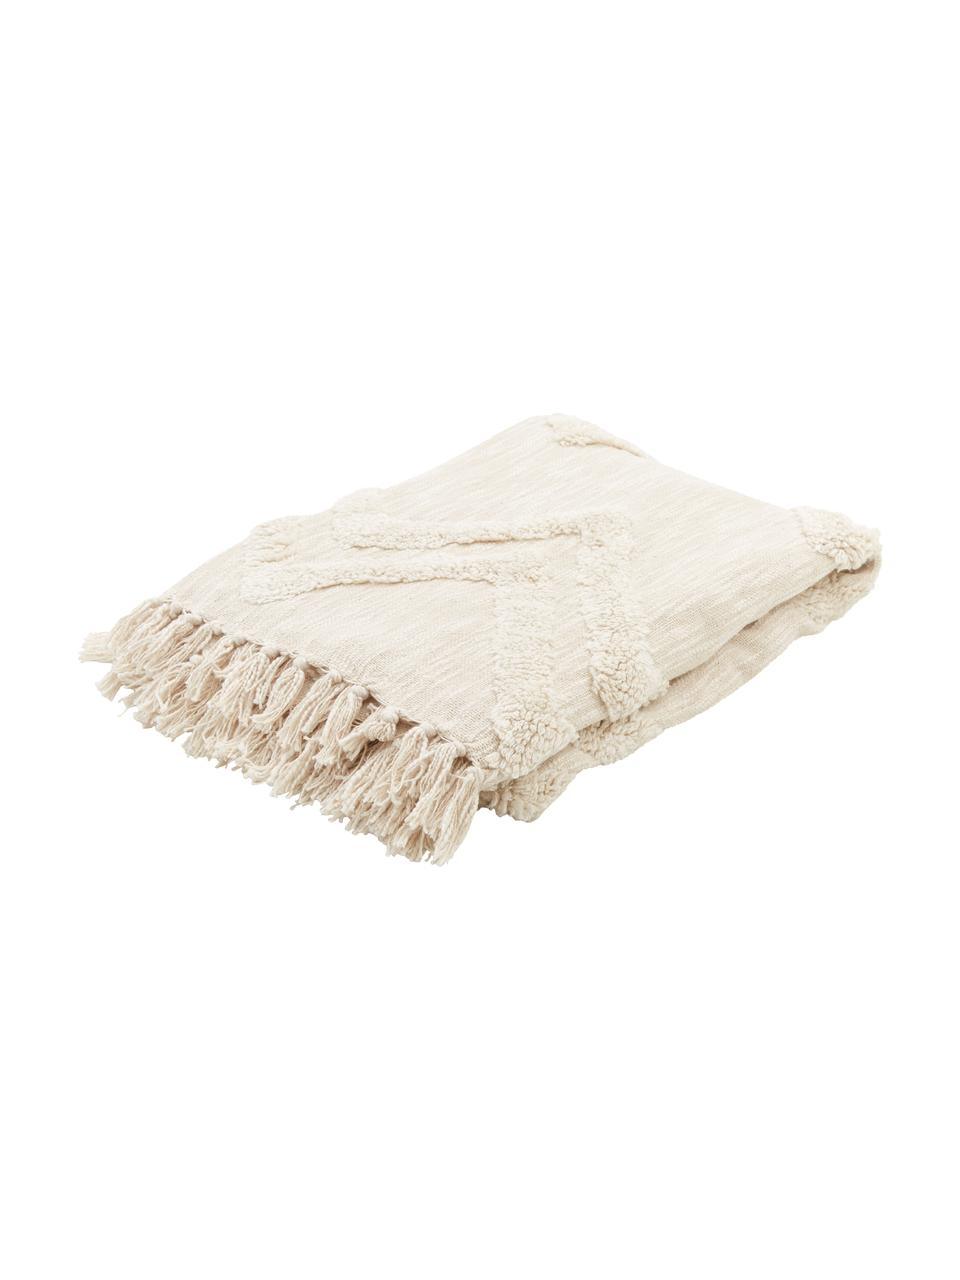 Plaid blanc écru coton bohème Akesha, Écru